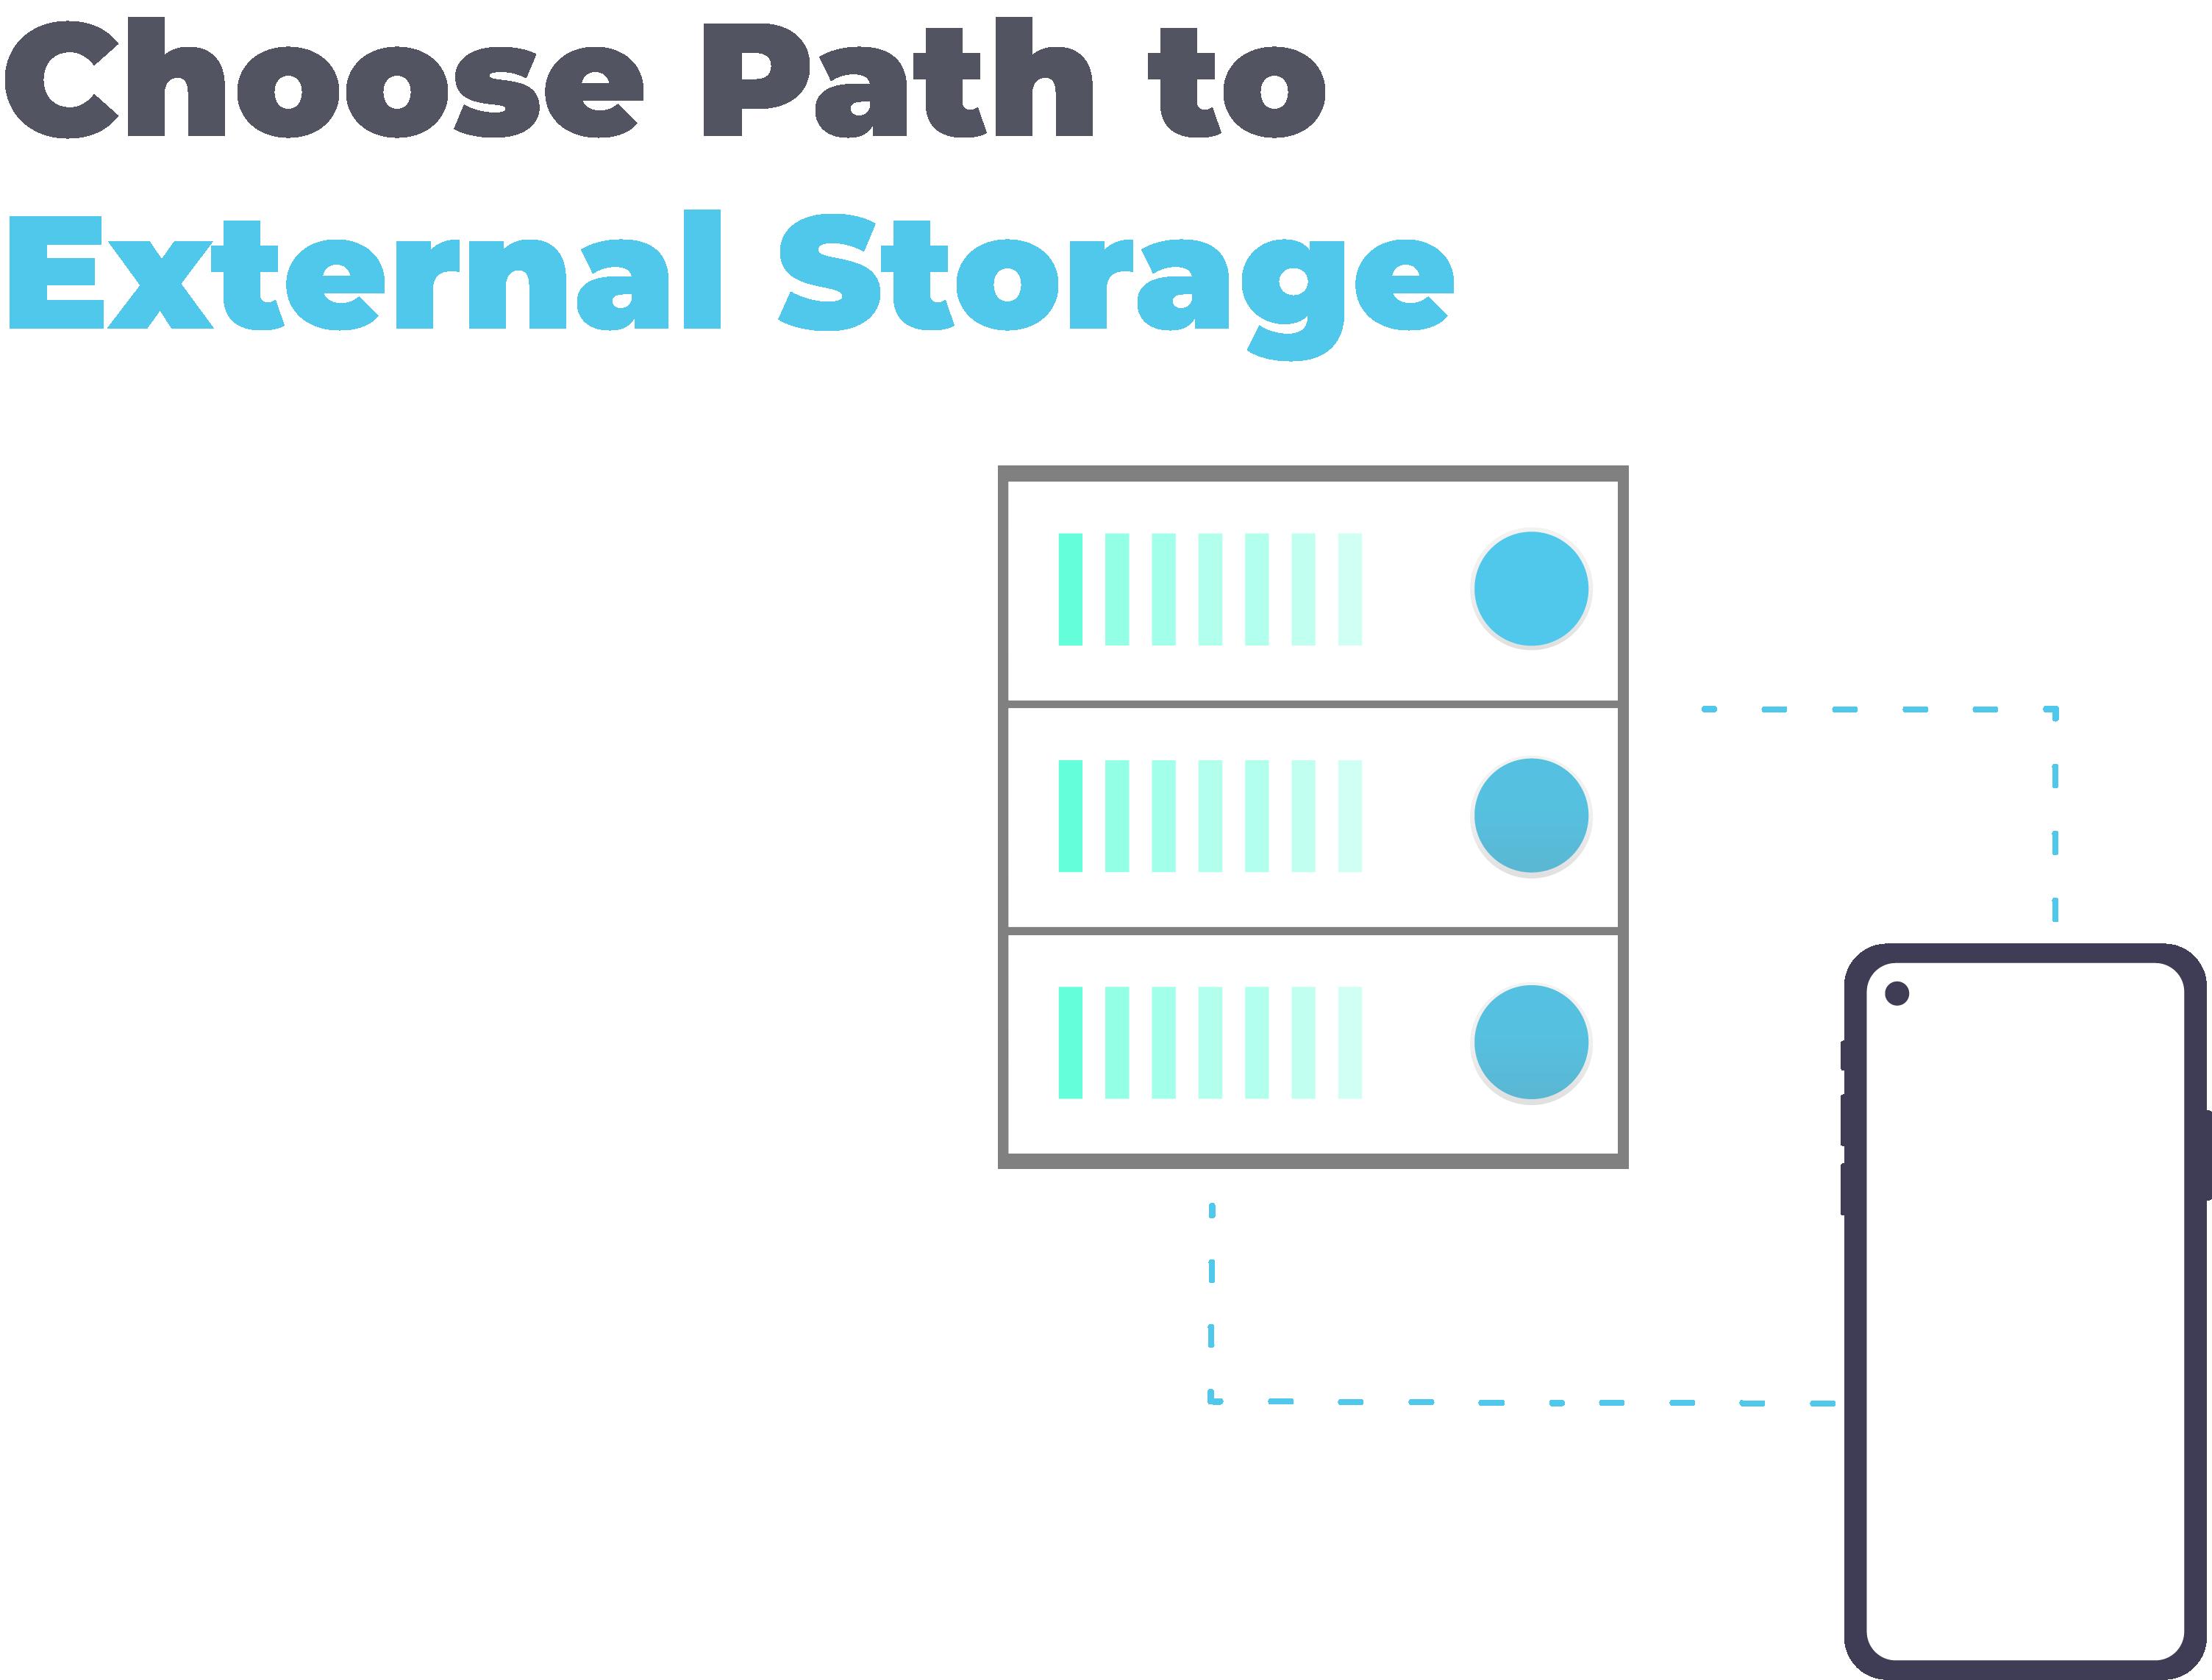 Choose Path to External Storage